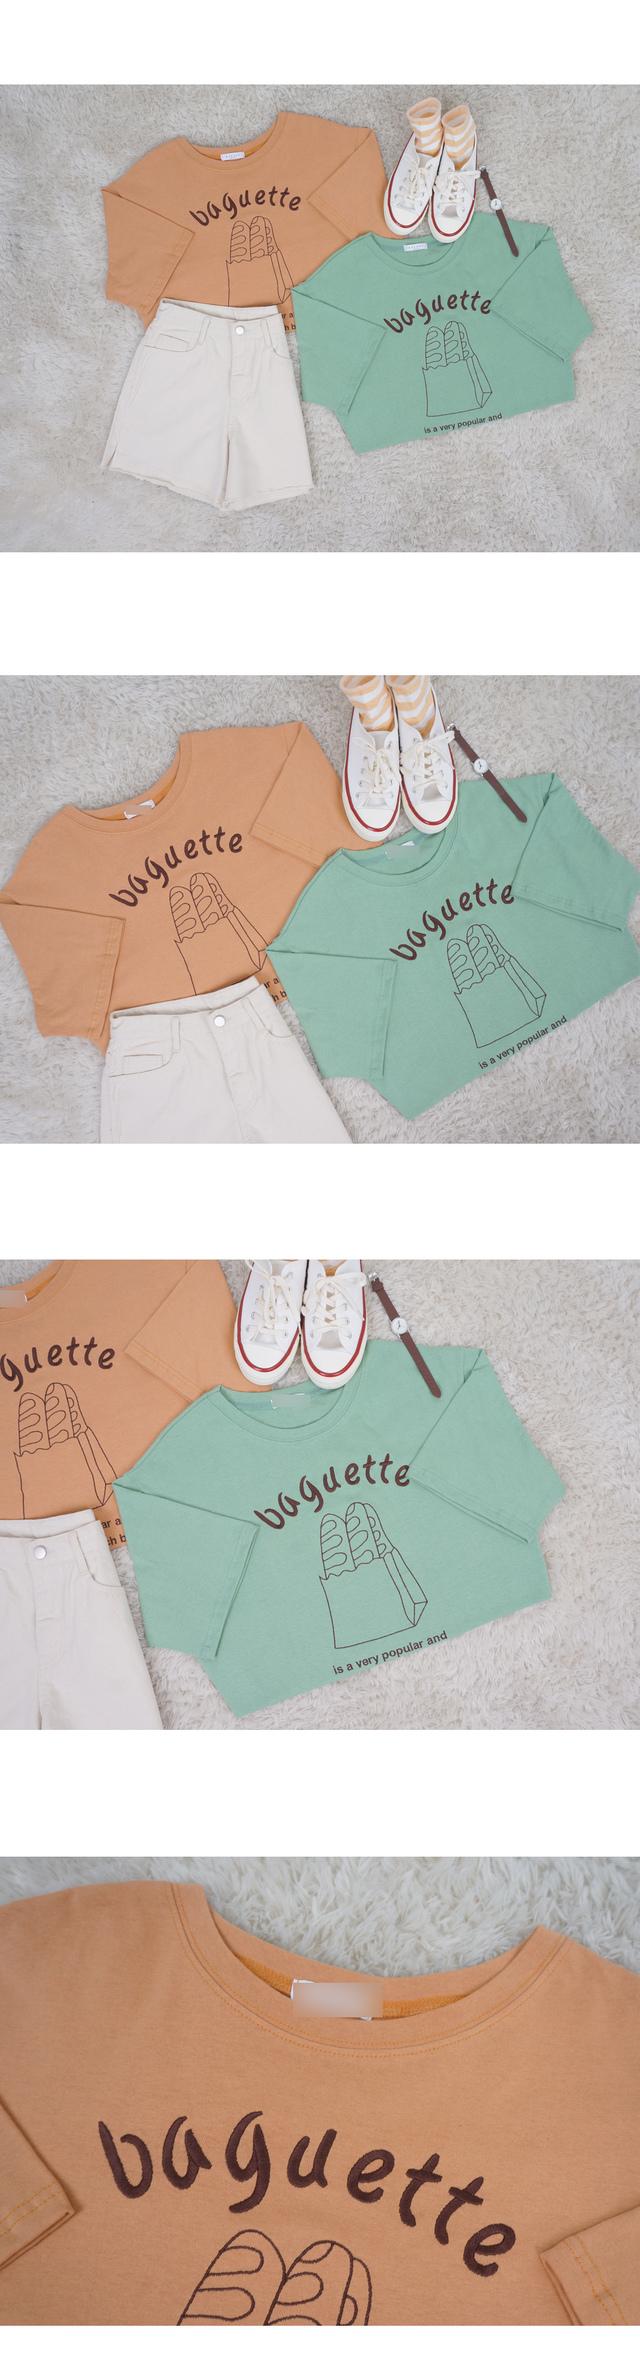 Baguette Short Sleeve T